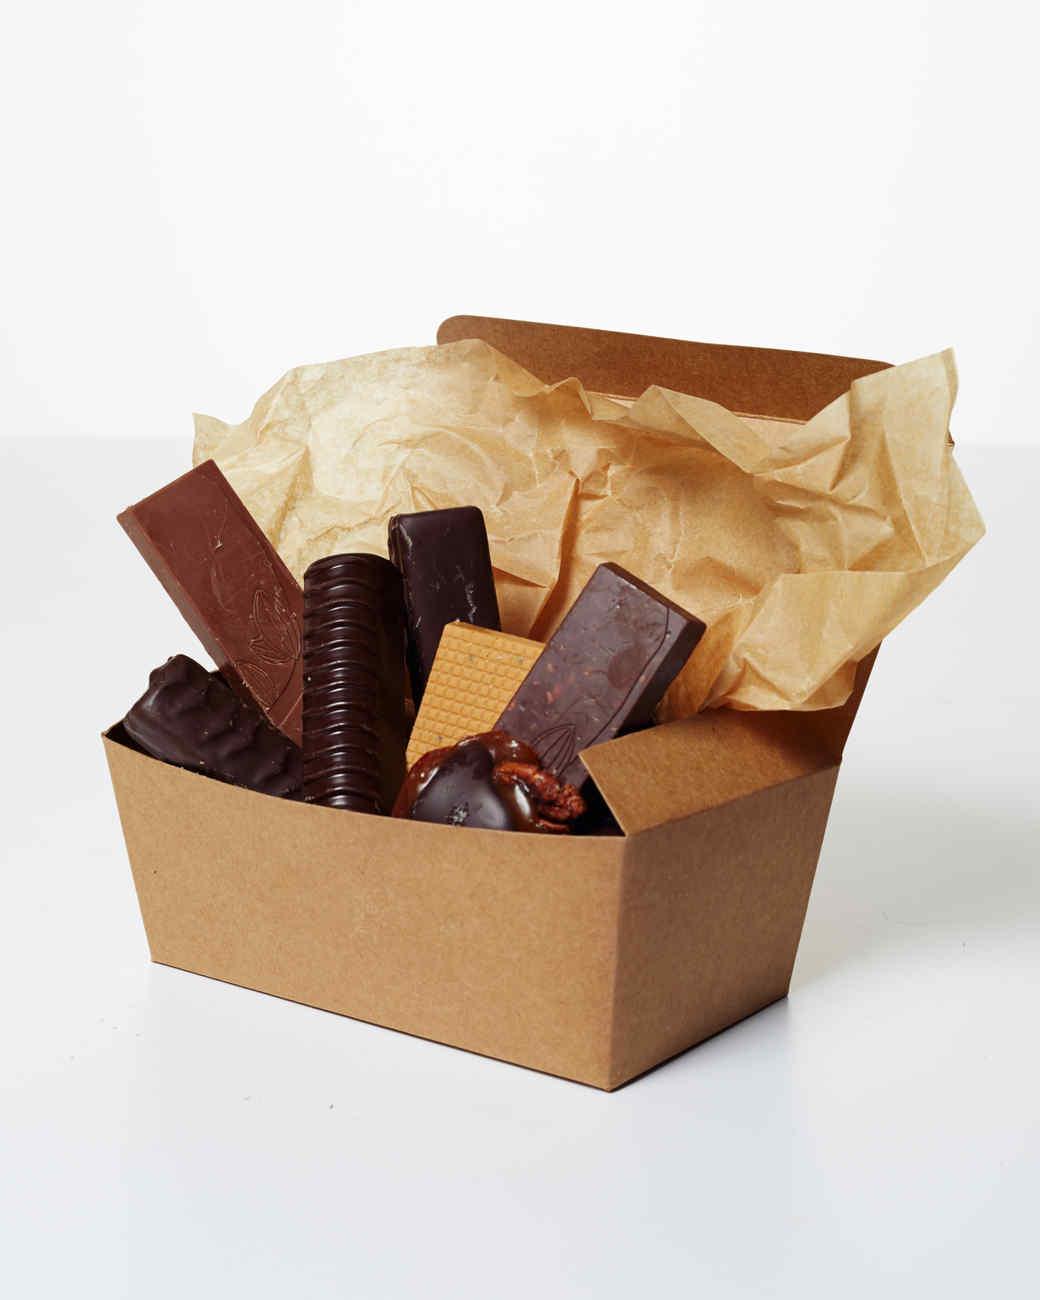 chocolates-in-box-189-d111535-1214.jpg